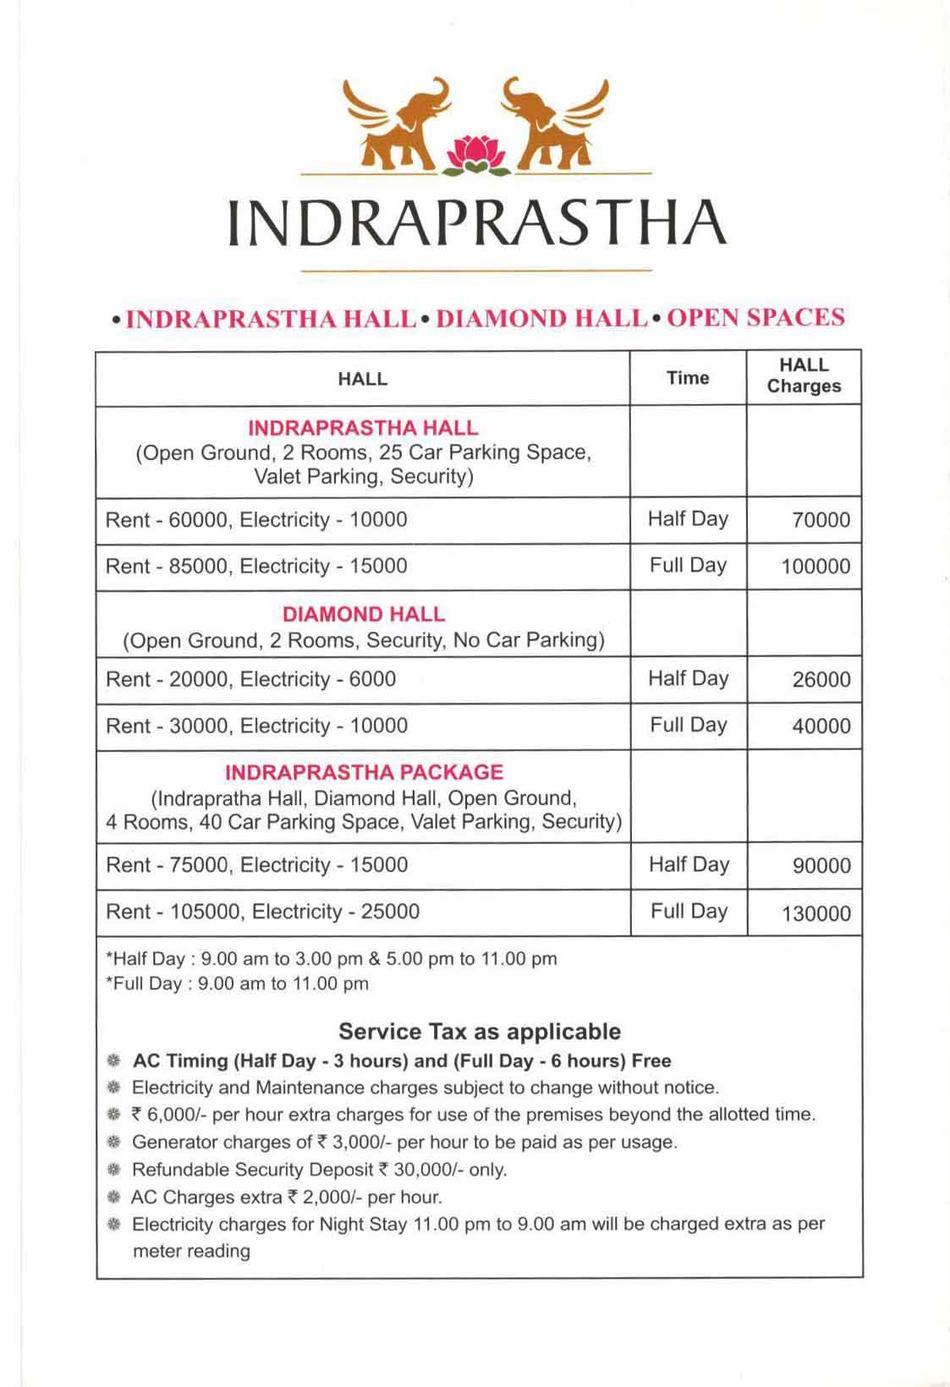 Indraprastha Hall Mulund Mumbai